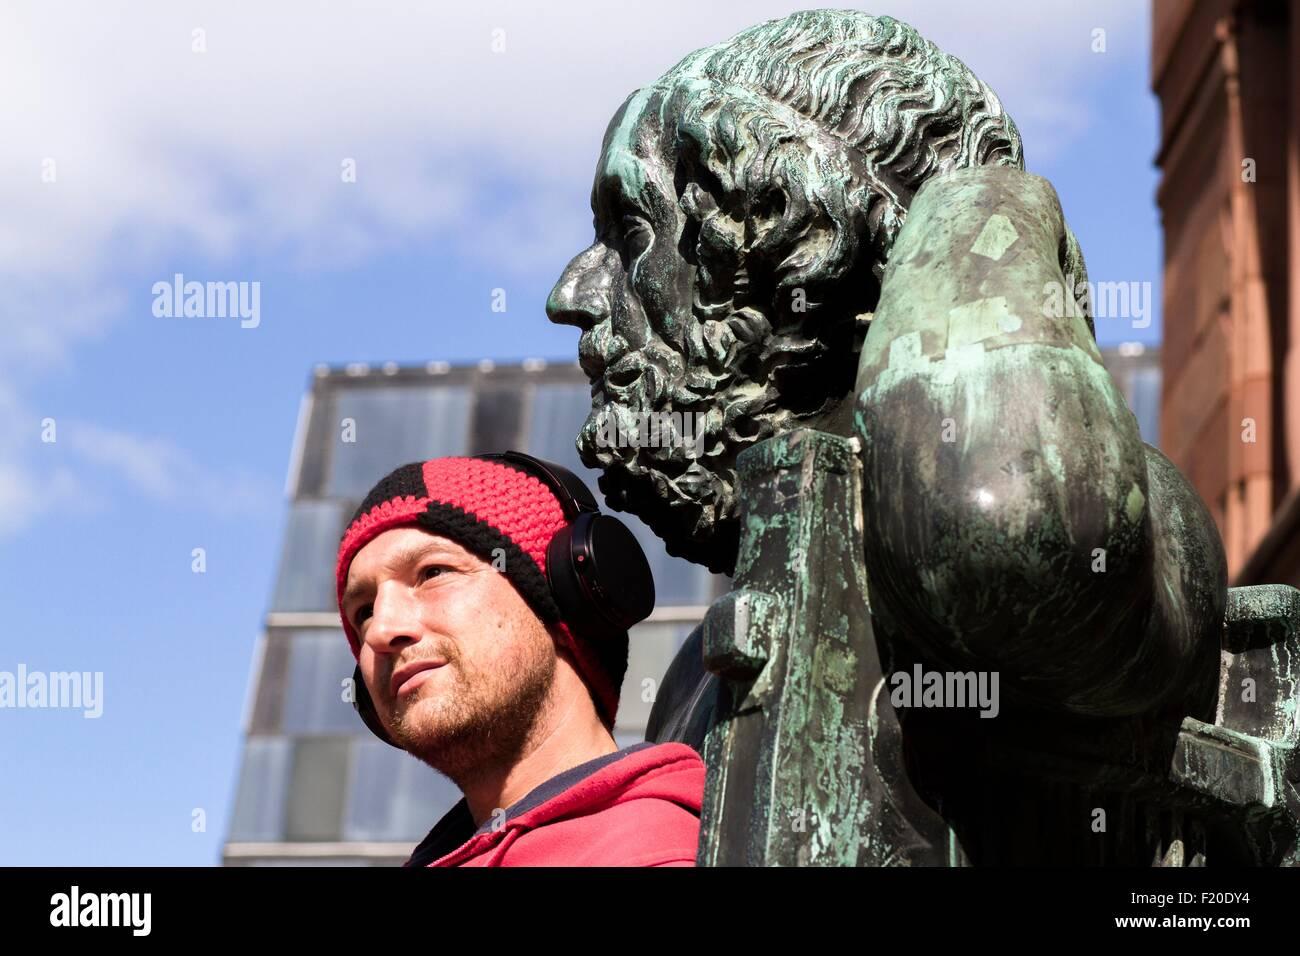 Portrait of mid adult man wearing headphones in front of sculpture, Freiburg, Baden, Germany - Stock Image